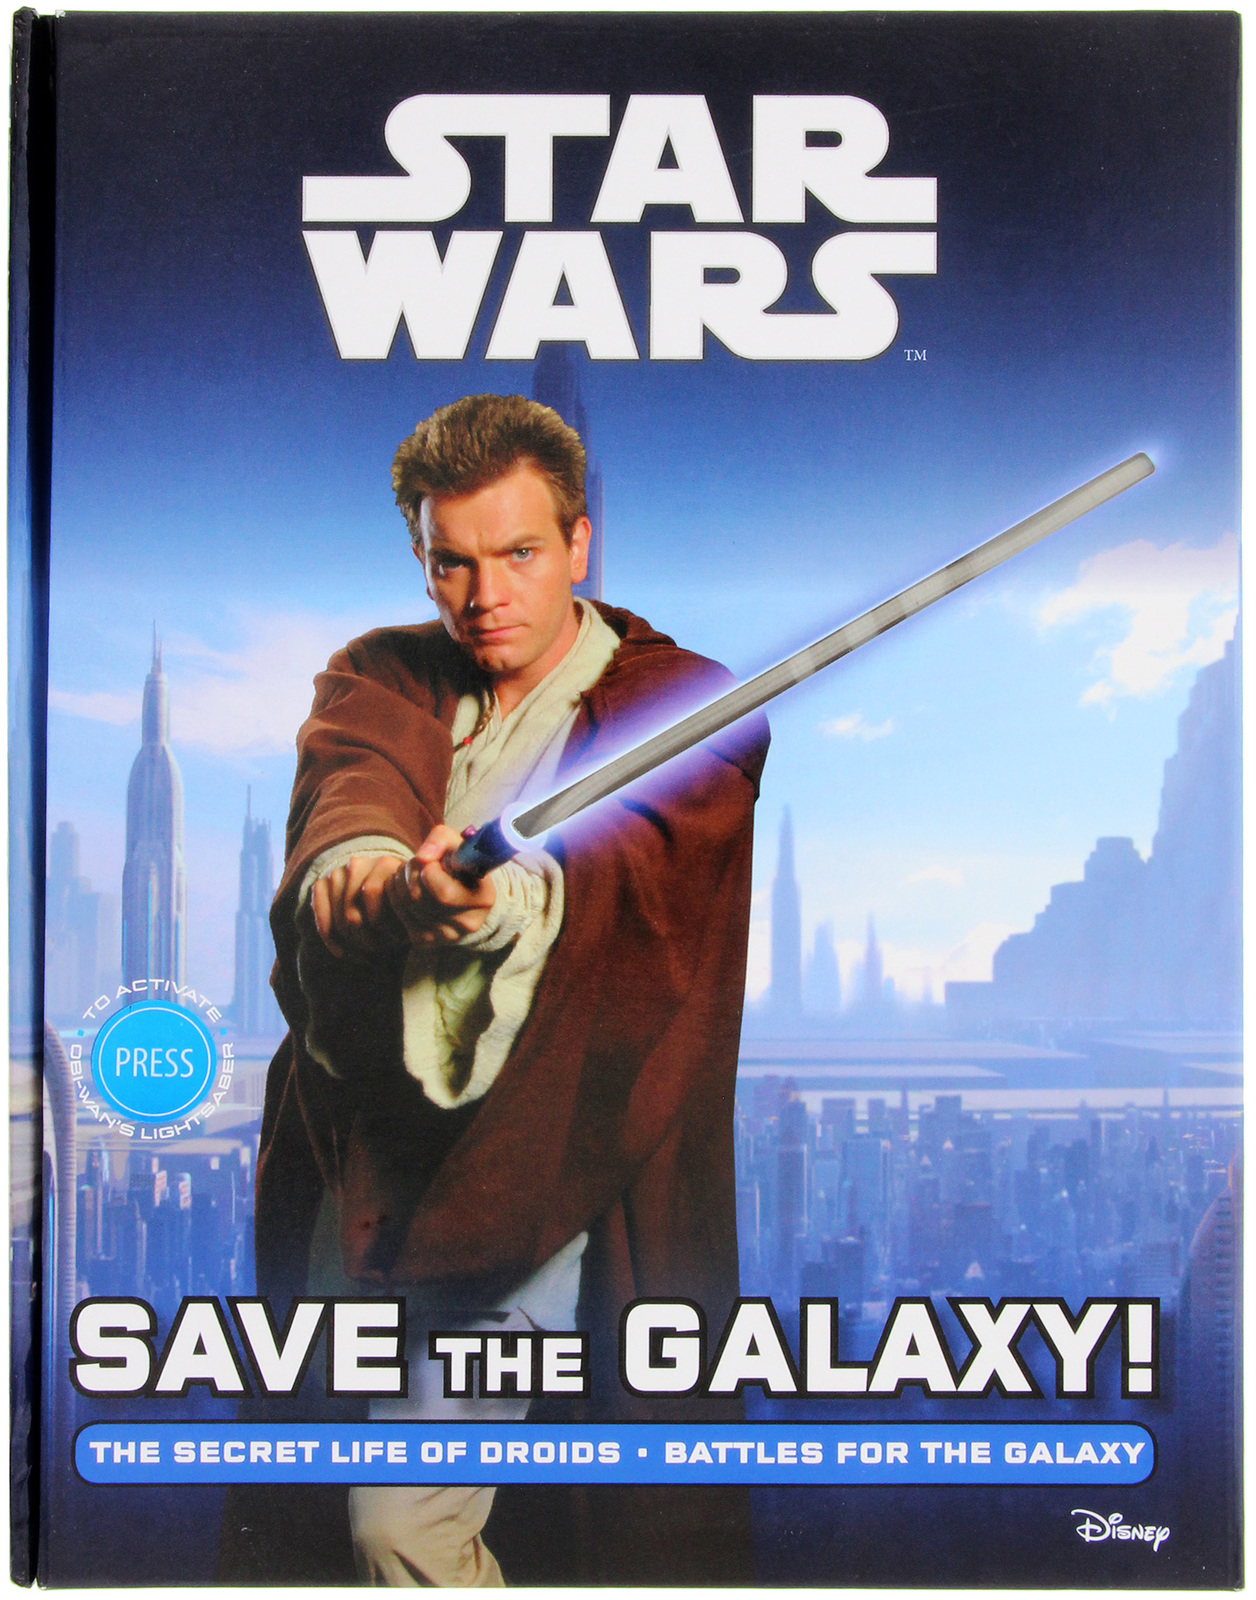 Star Wars Save The Galaxy image